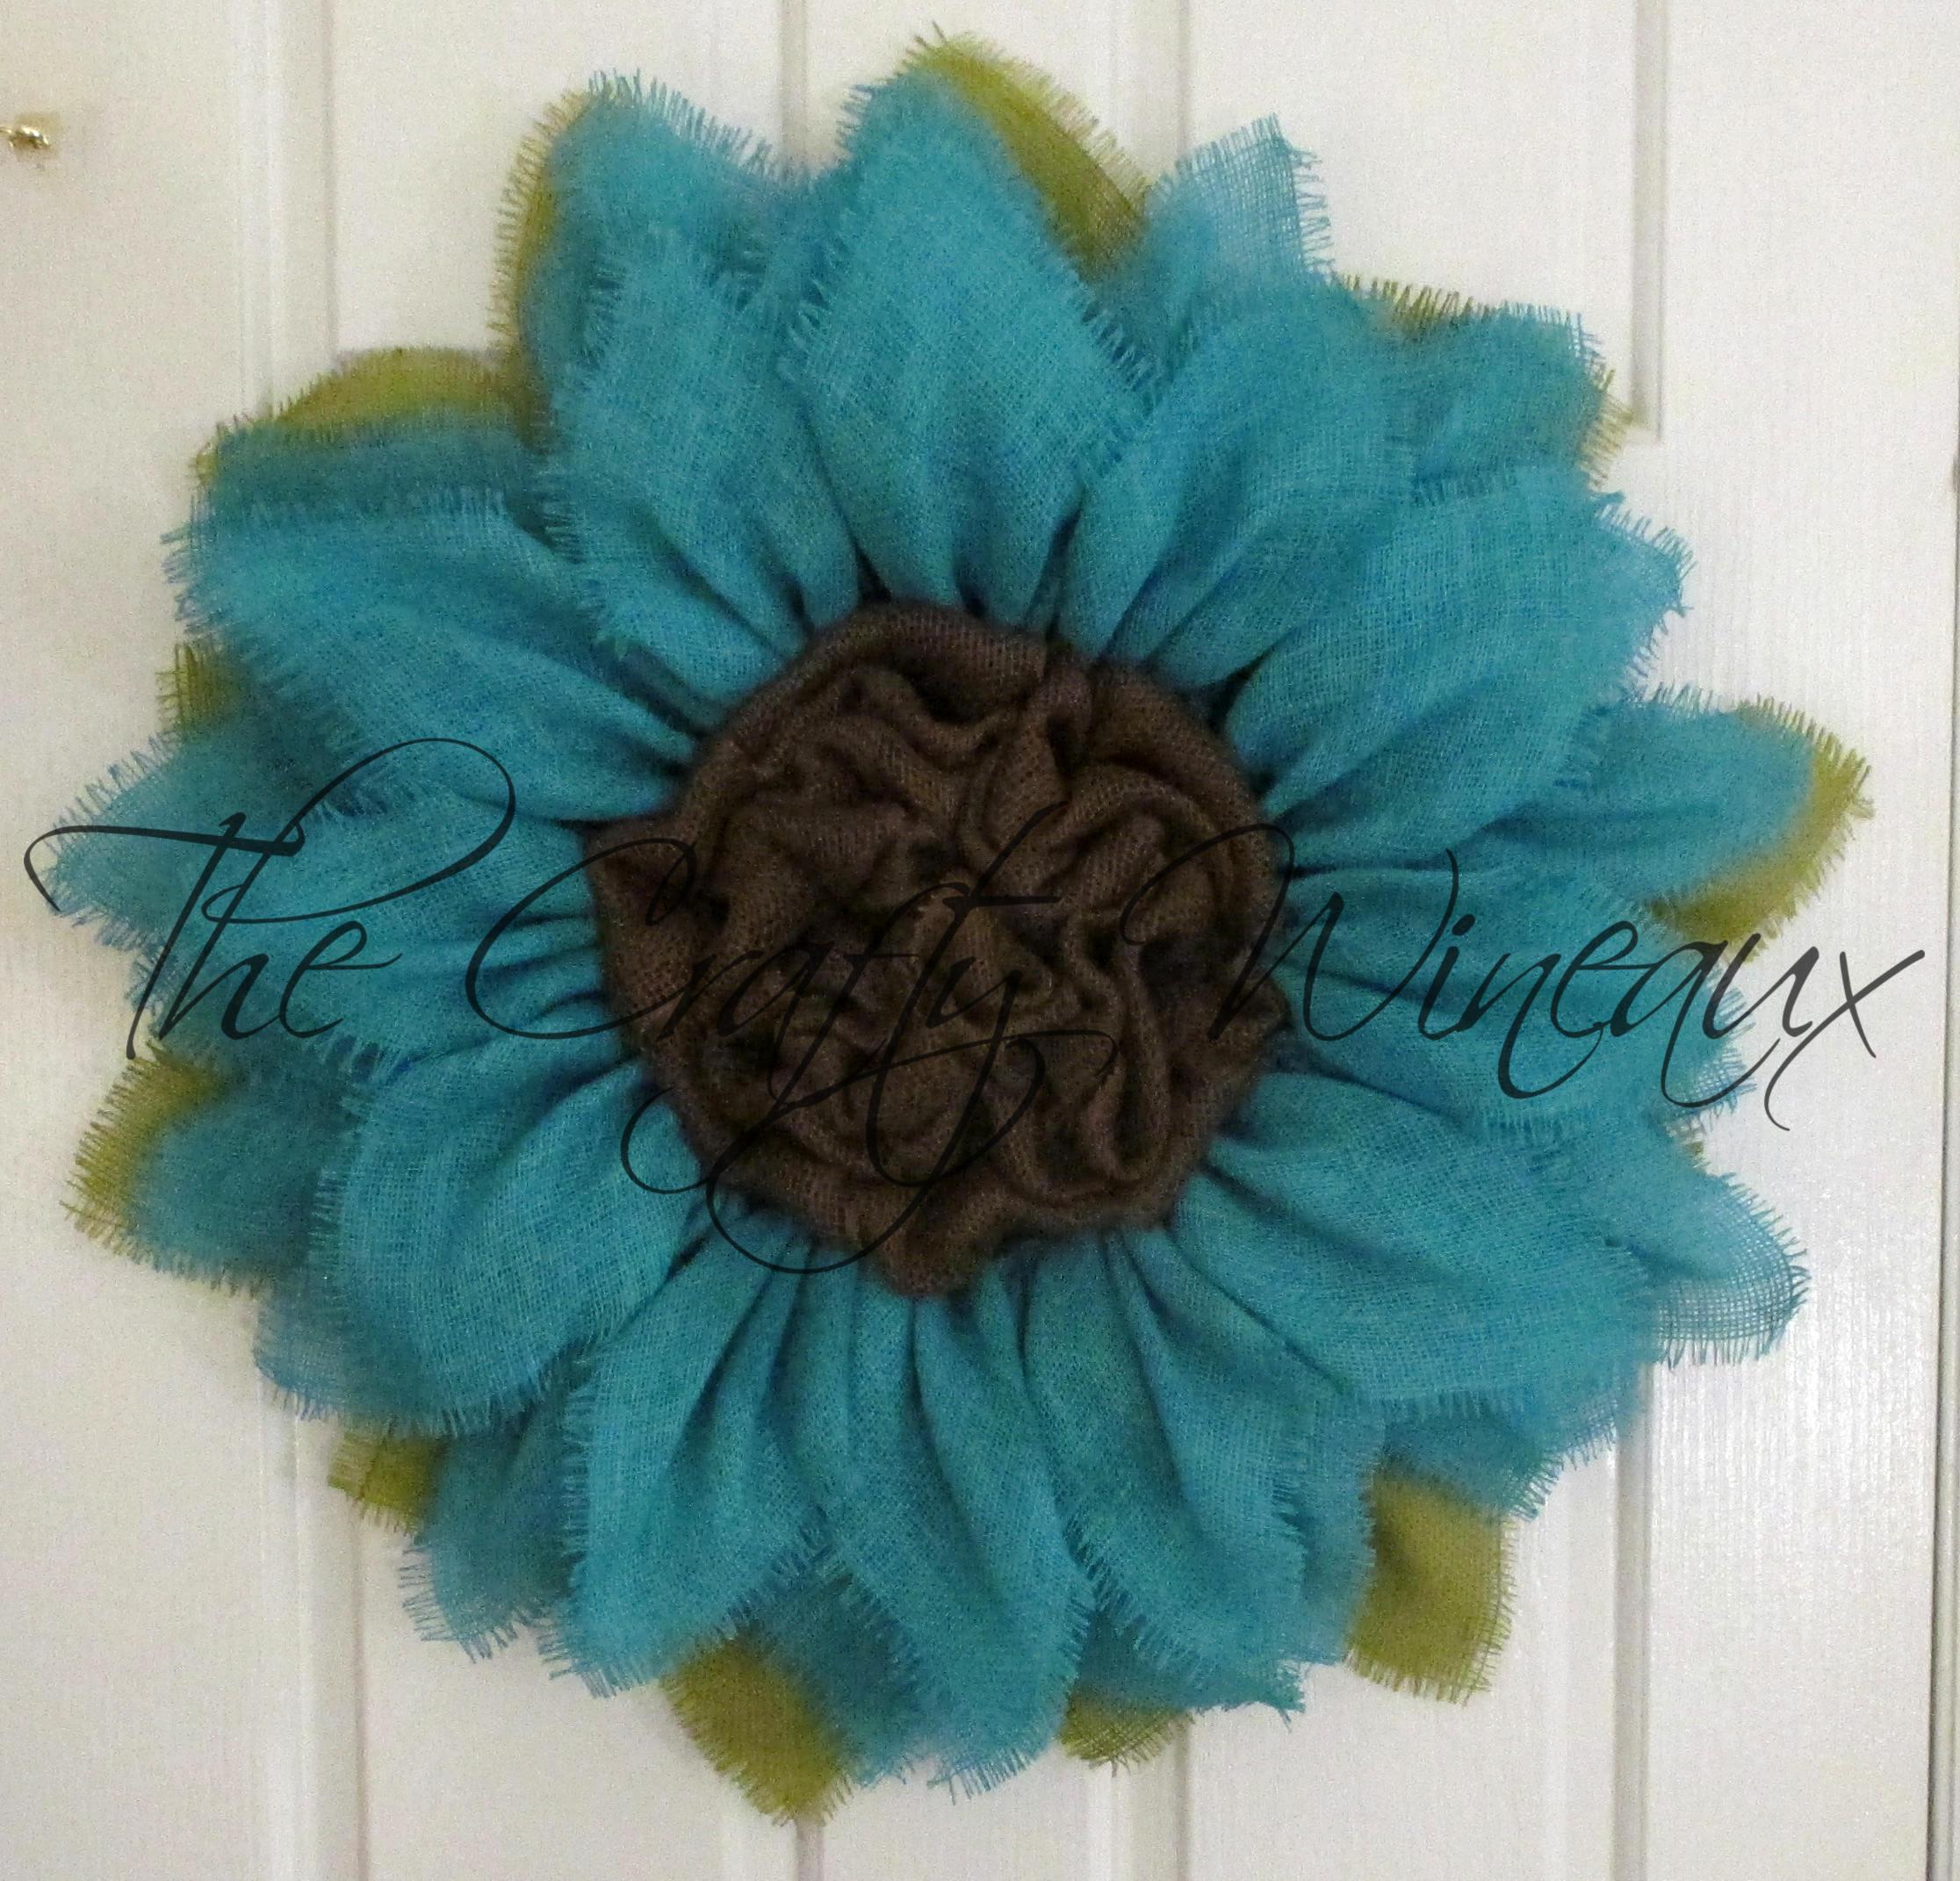 Spring Flower Wreath Sunflower Door Hanger Small Jade Blue Burlap Sunflower Wreath Summer Sunflower Burlap Wreath Free Shipping